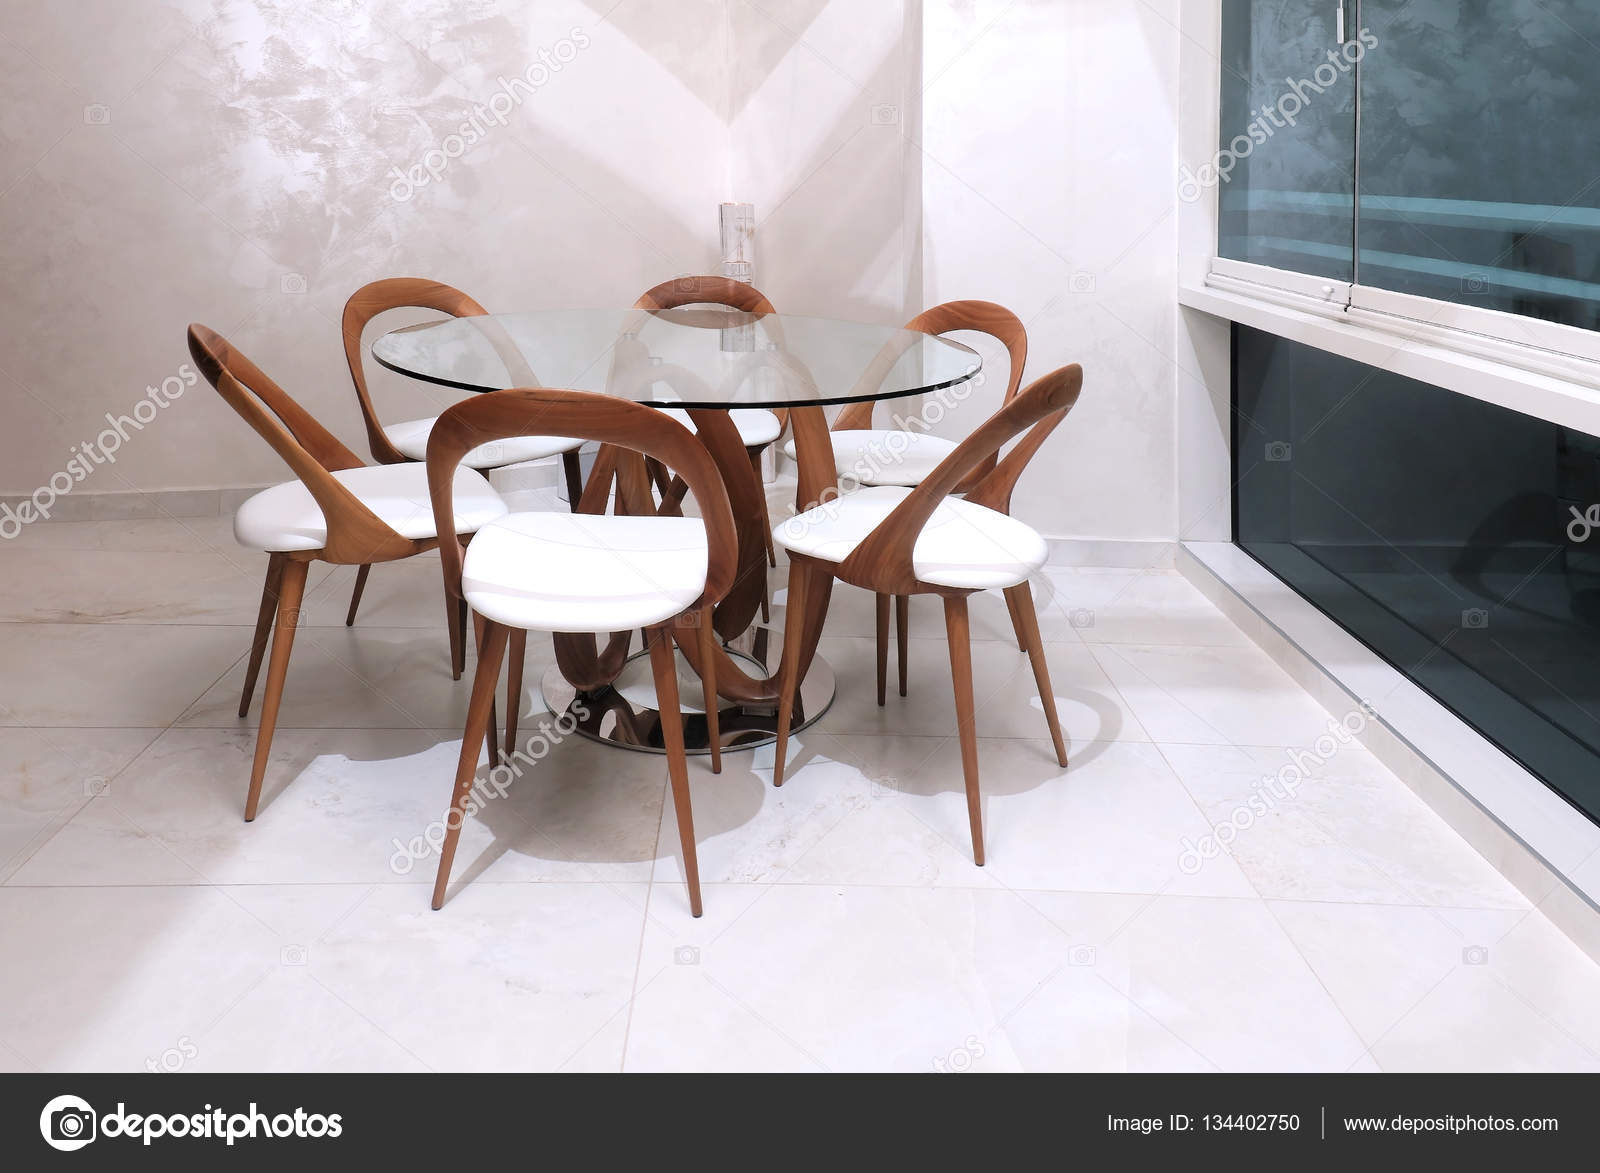 tavolo da pranzo moderno — Foto Stock © ttatty #134402750